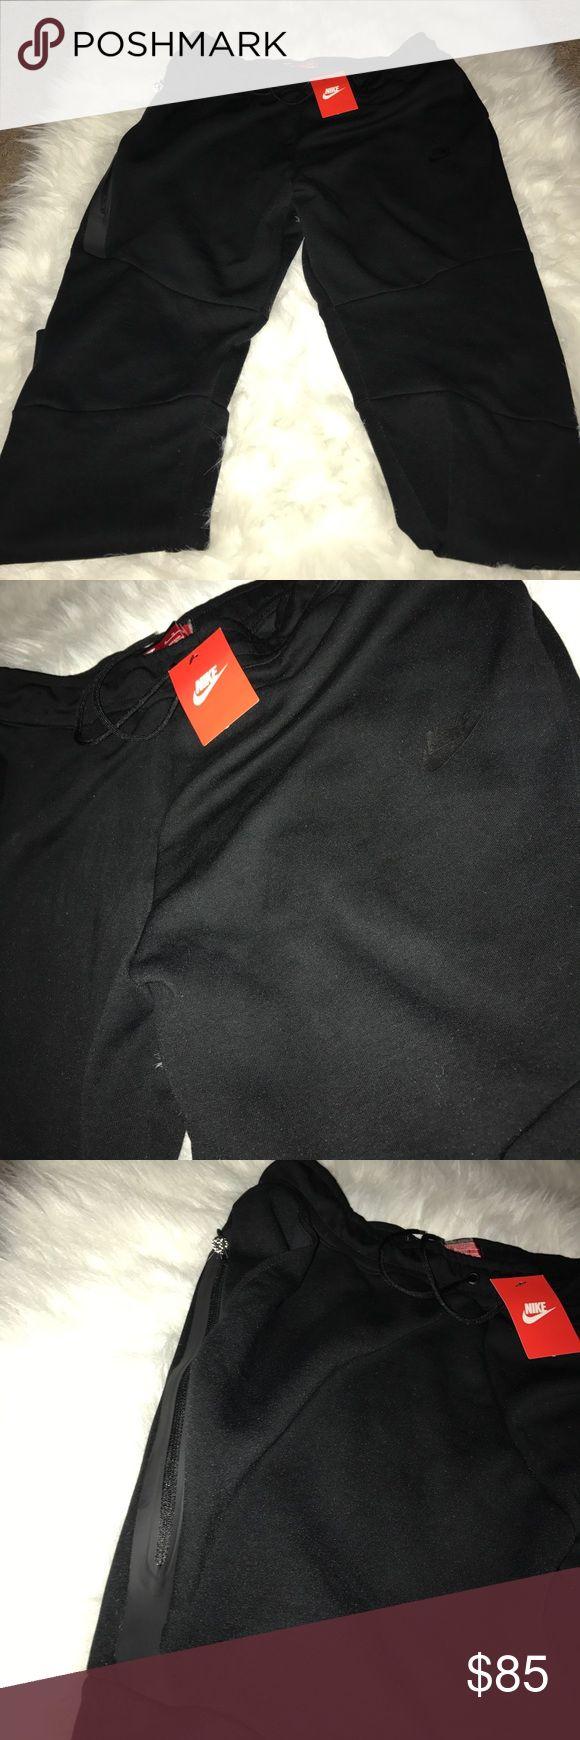 New Nike men's joggers tech black size xl New Nike men's joggers tech black size xl Nike Pants Sweatpants & Joggers